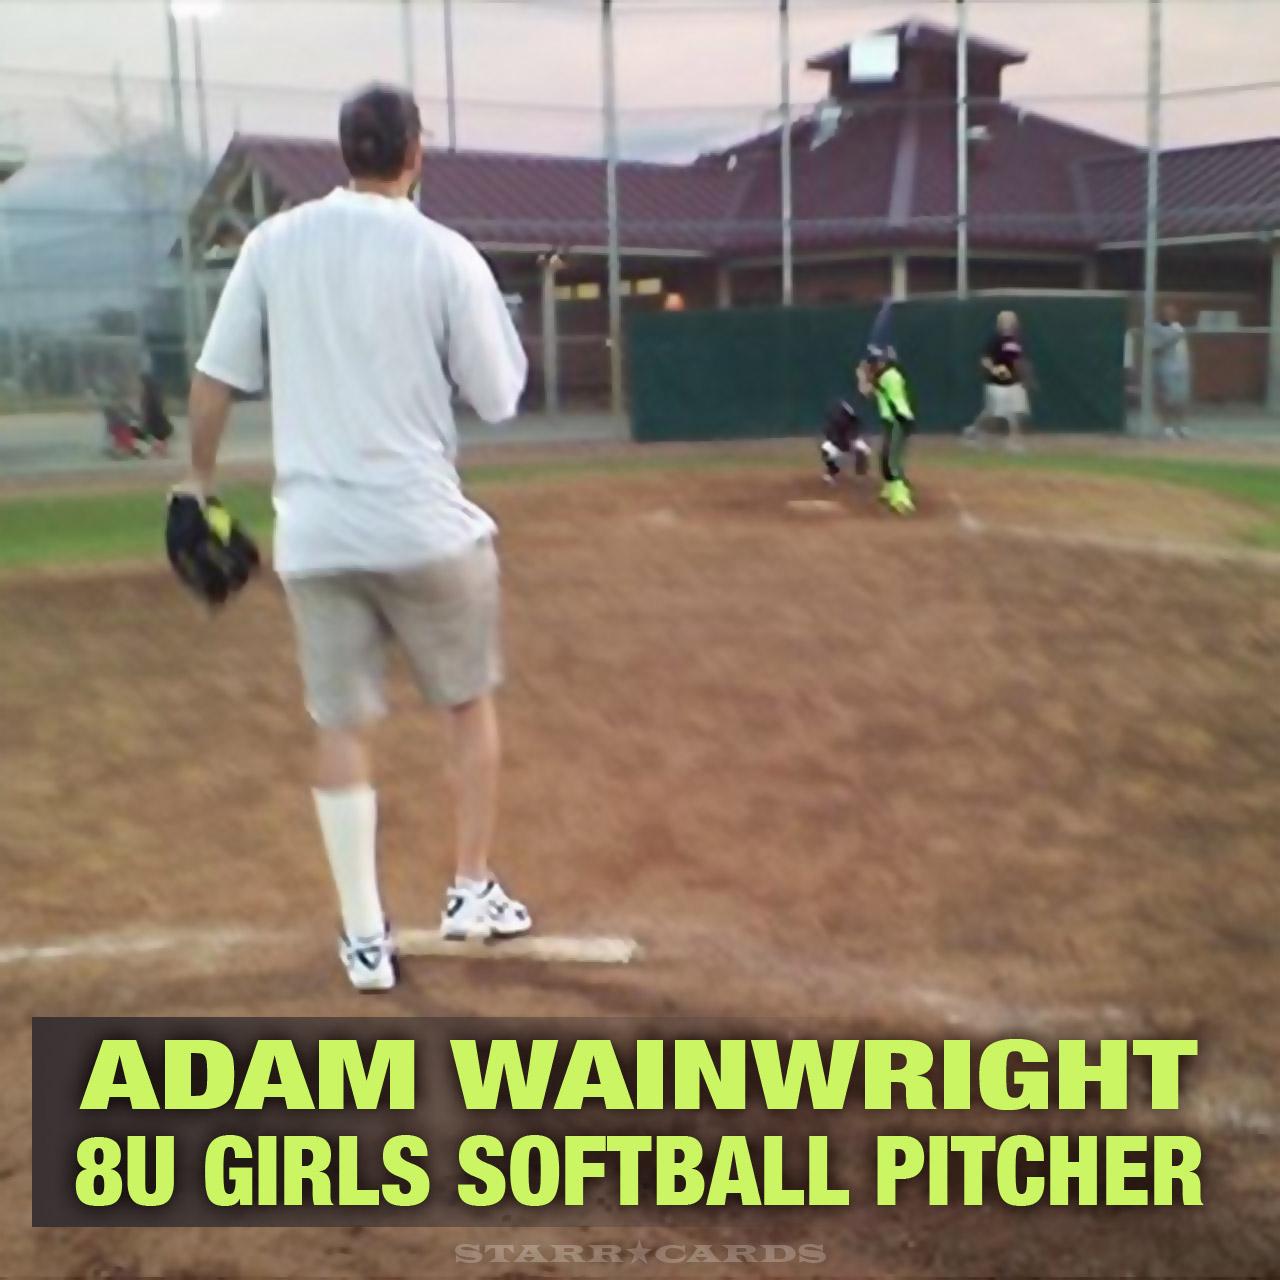 Cardinals Adam Wainwright moonlights as 8u girls softball pitcher